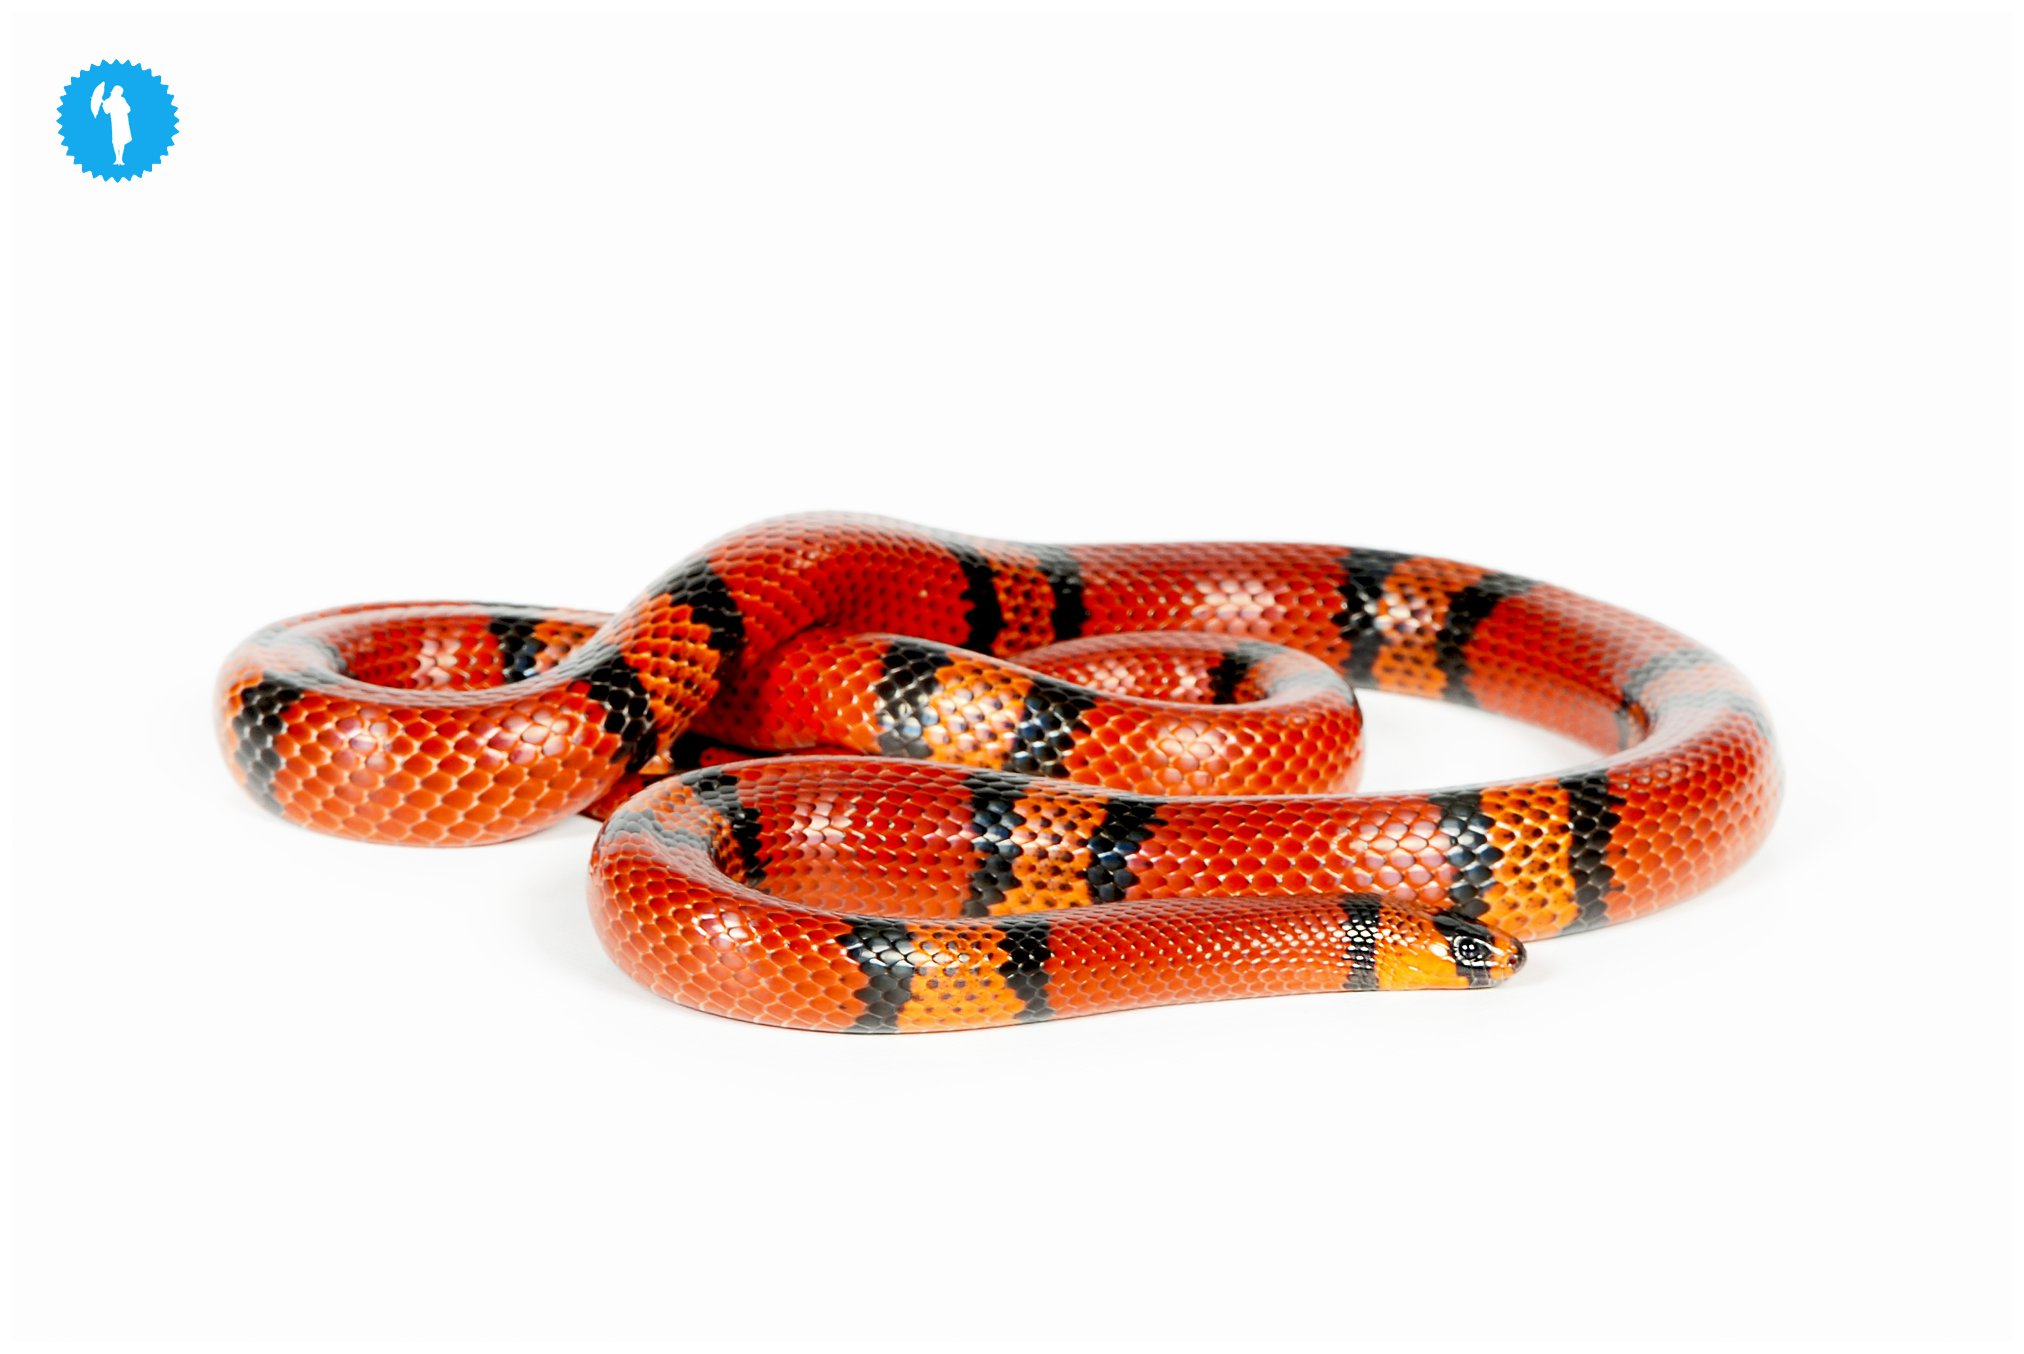 Snake pet photography by Emily Beatty, 2013.